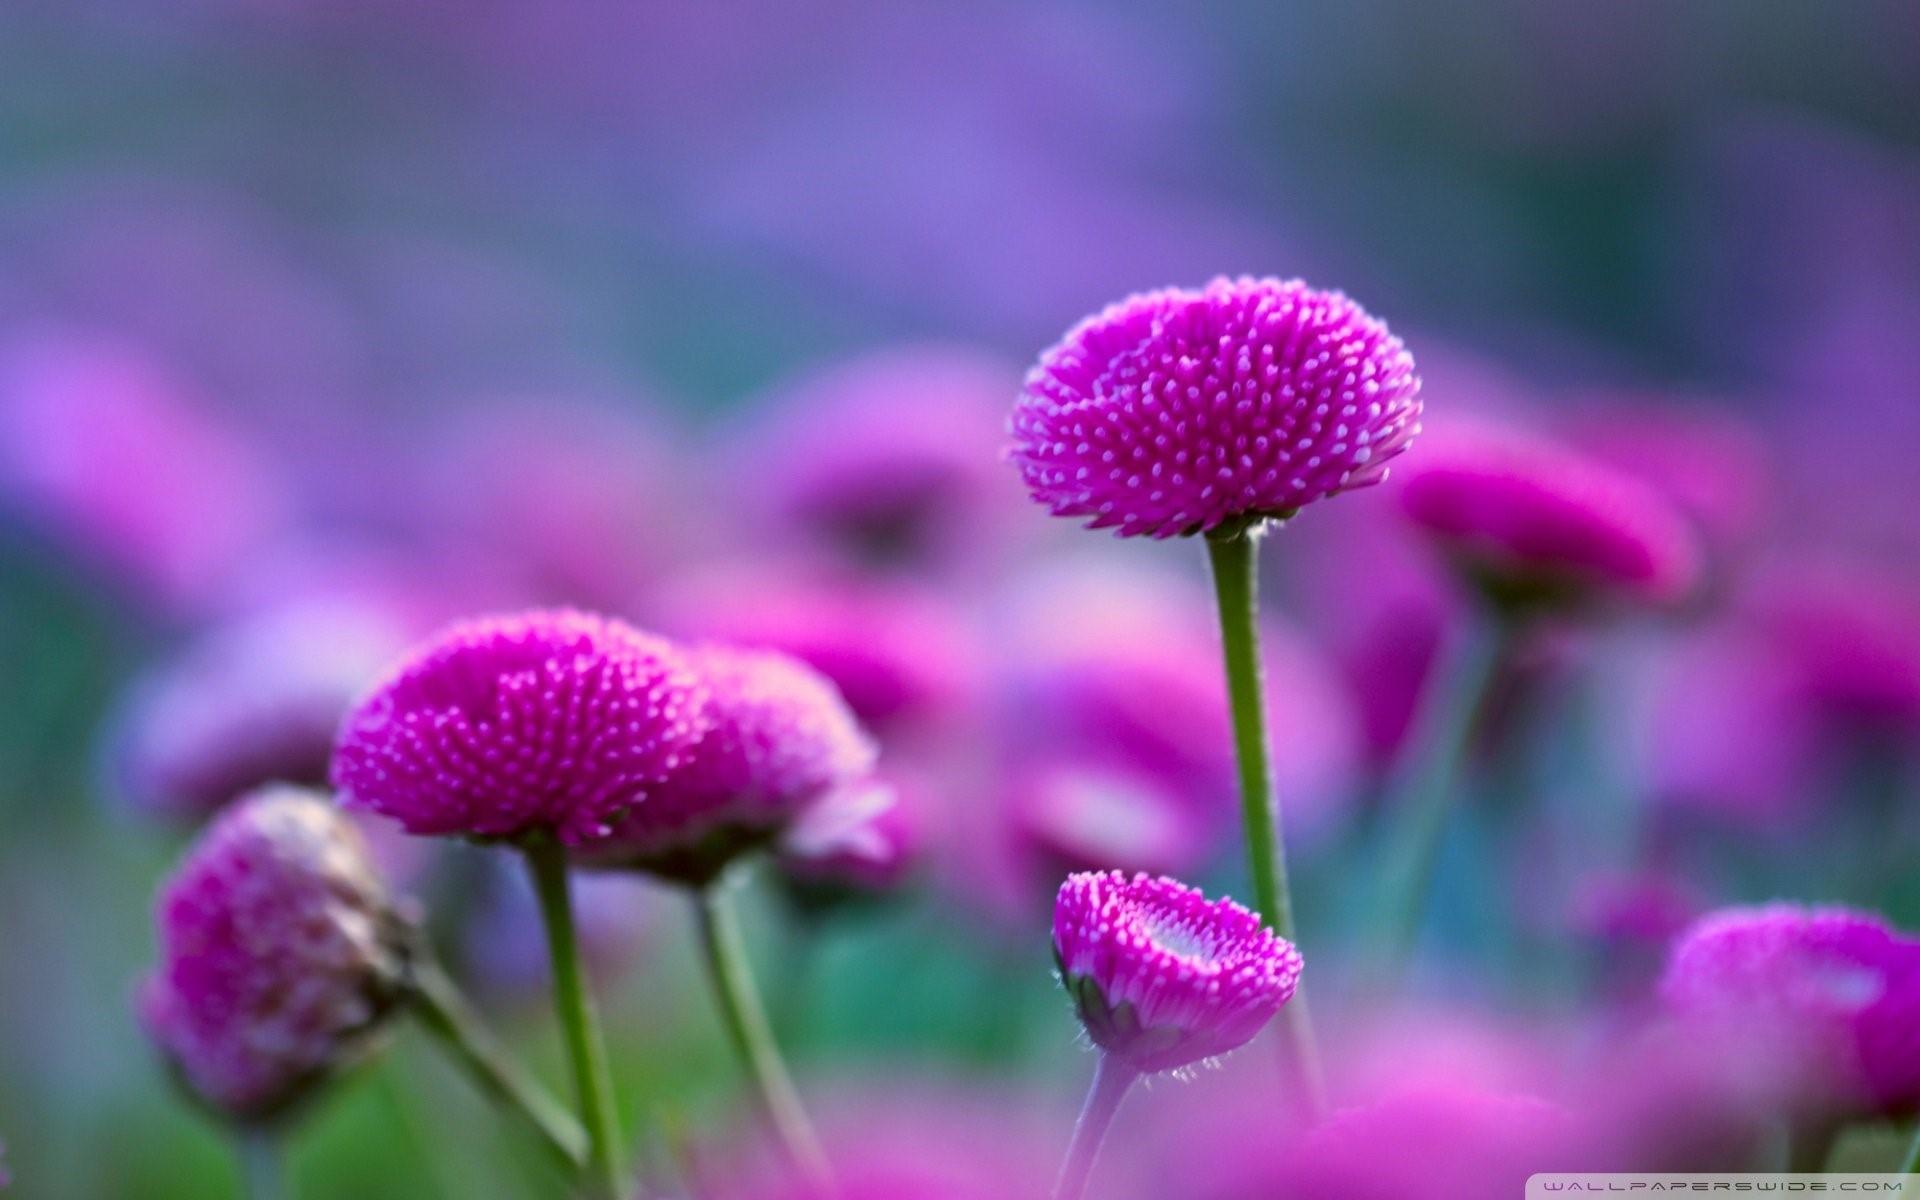 Beautiful Flowers Nature Wallpaper Hd 12 Widescreen - Flower Beautiful Pictures Of Nature , HD Wallpaper & Backgrounds